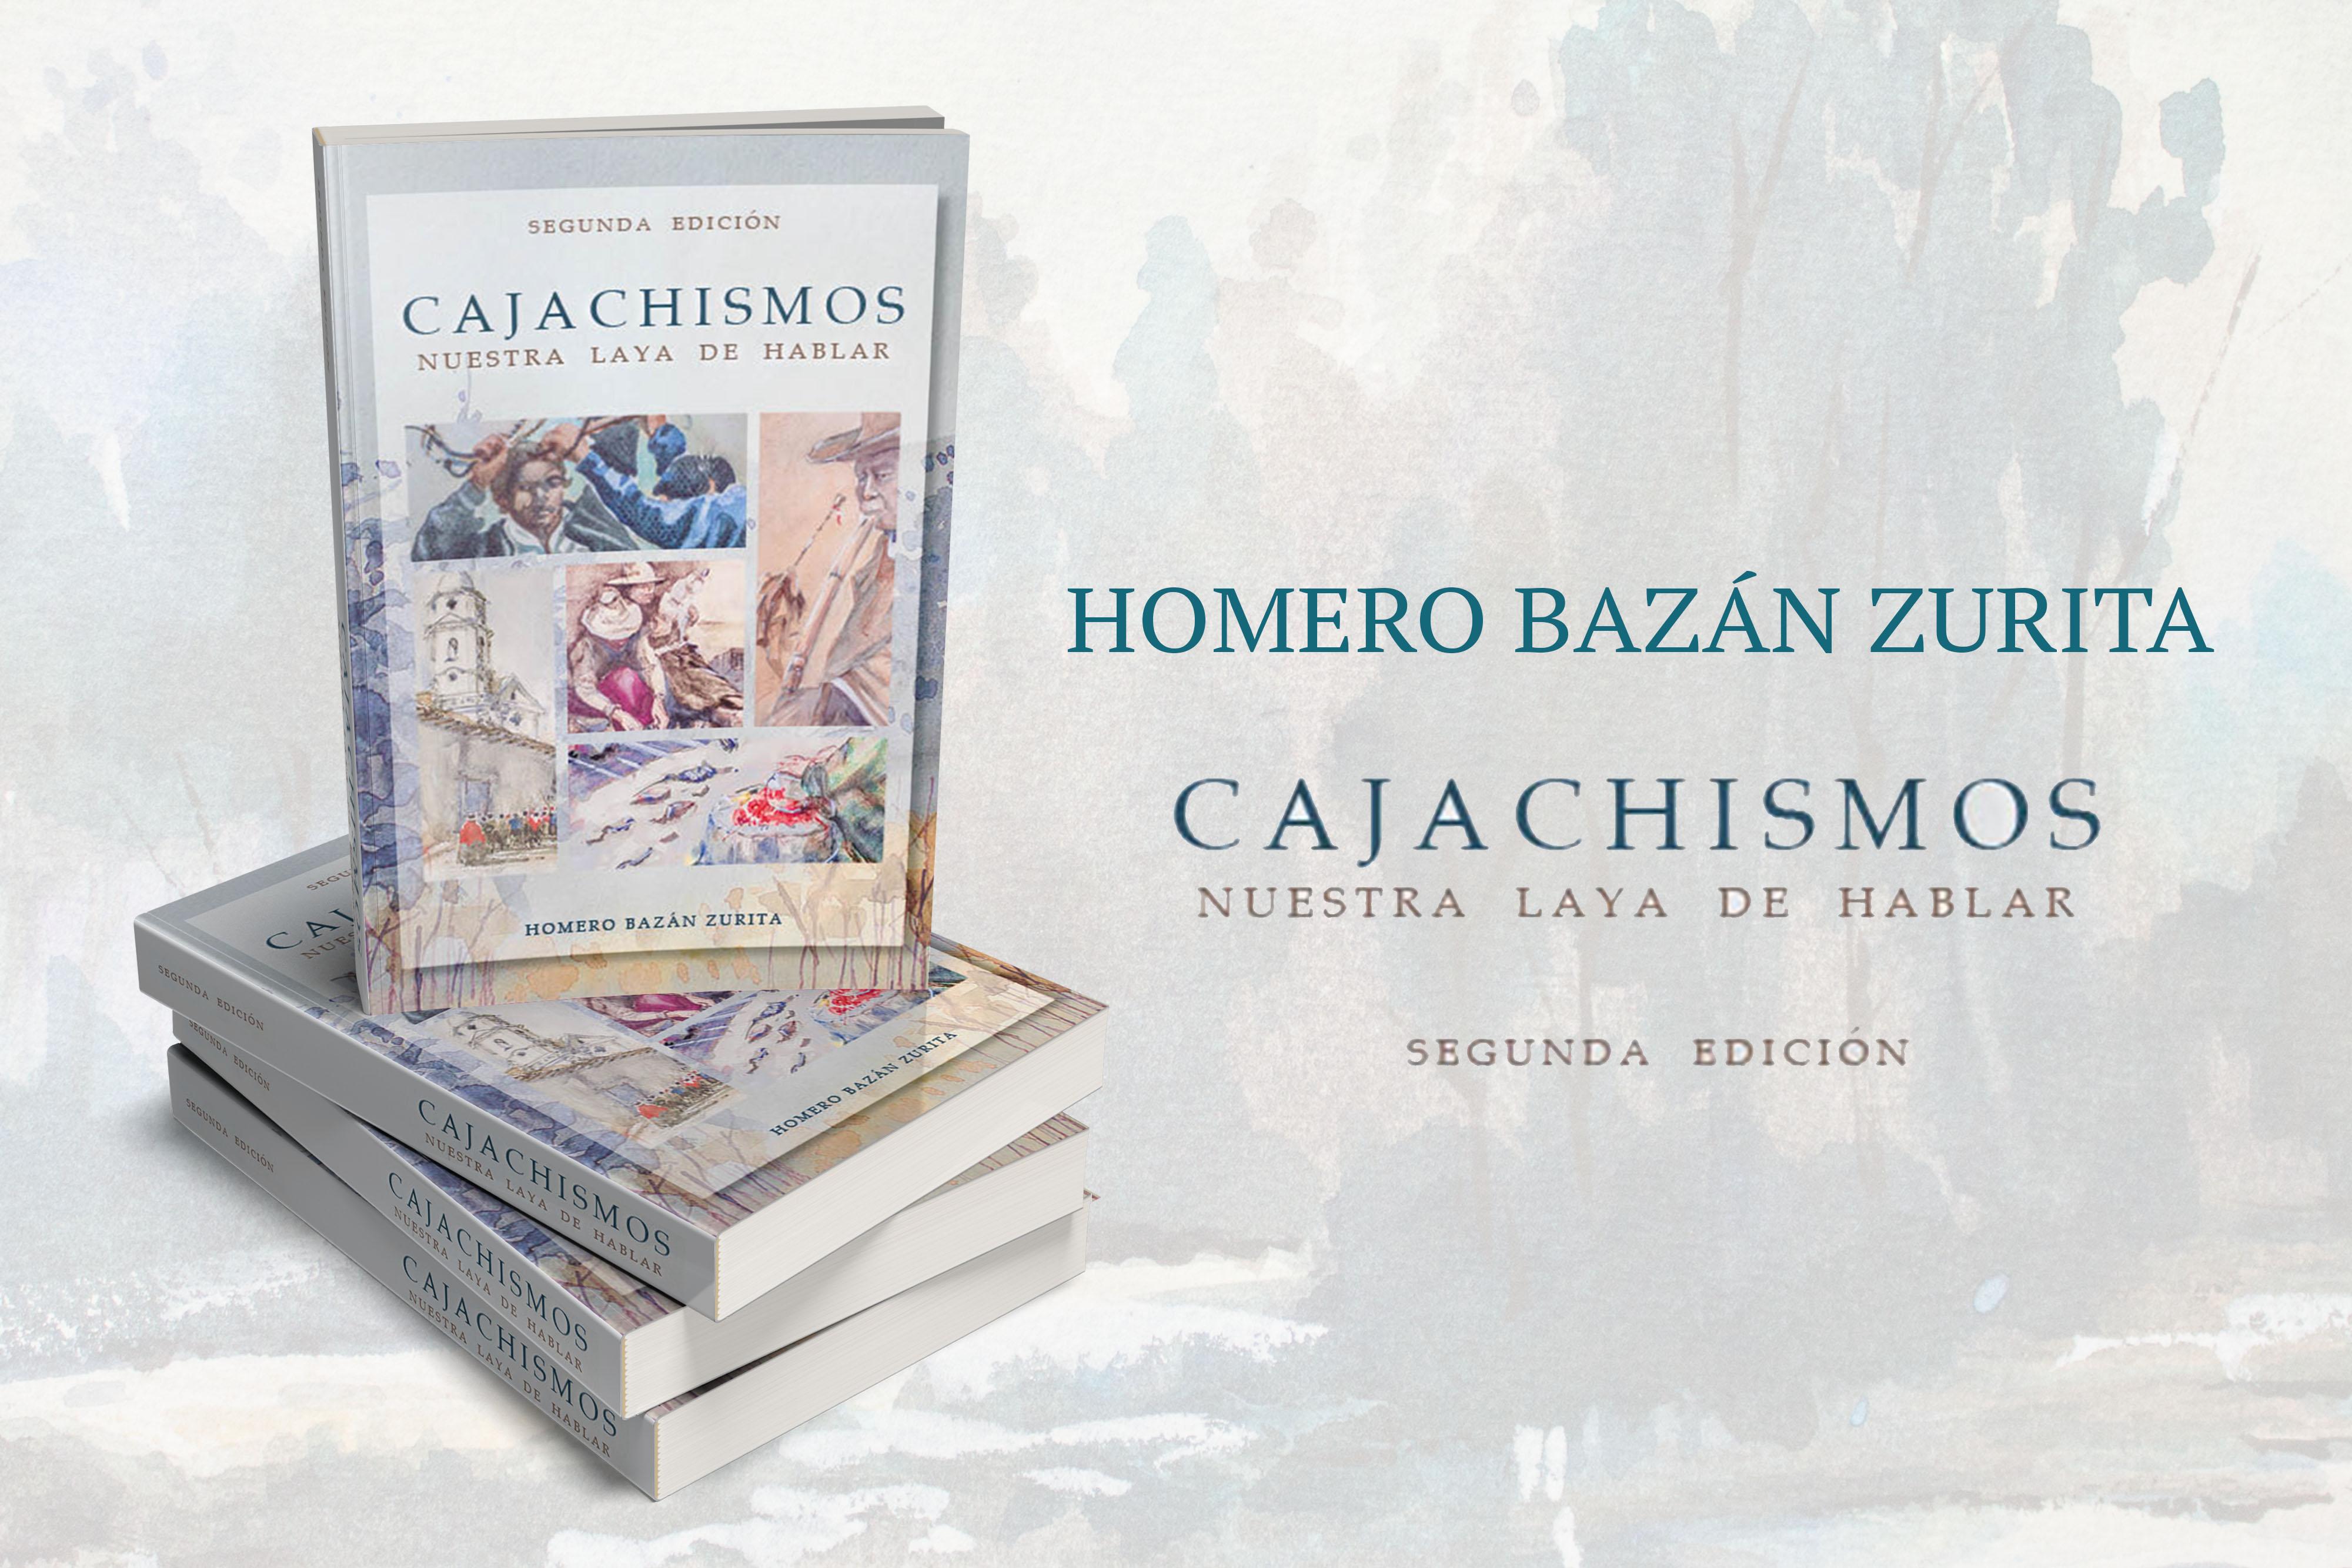 CAJACHISMOS ARTES